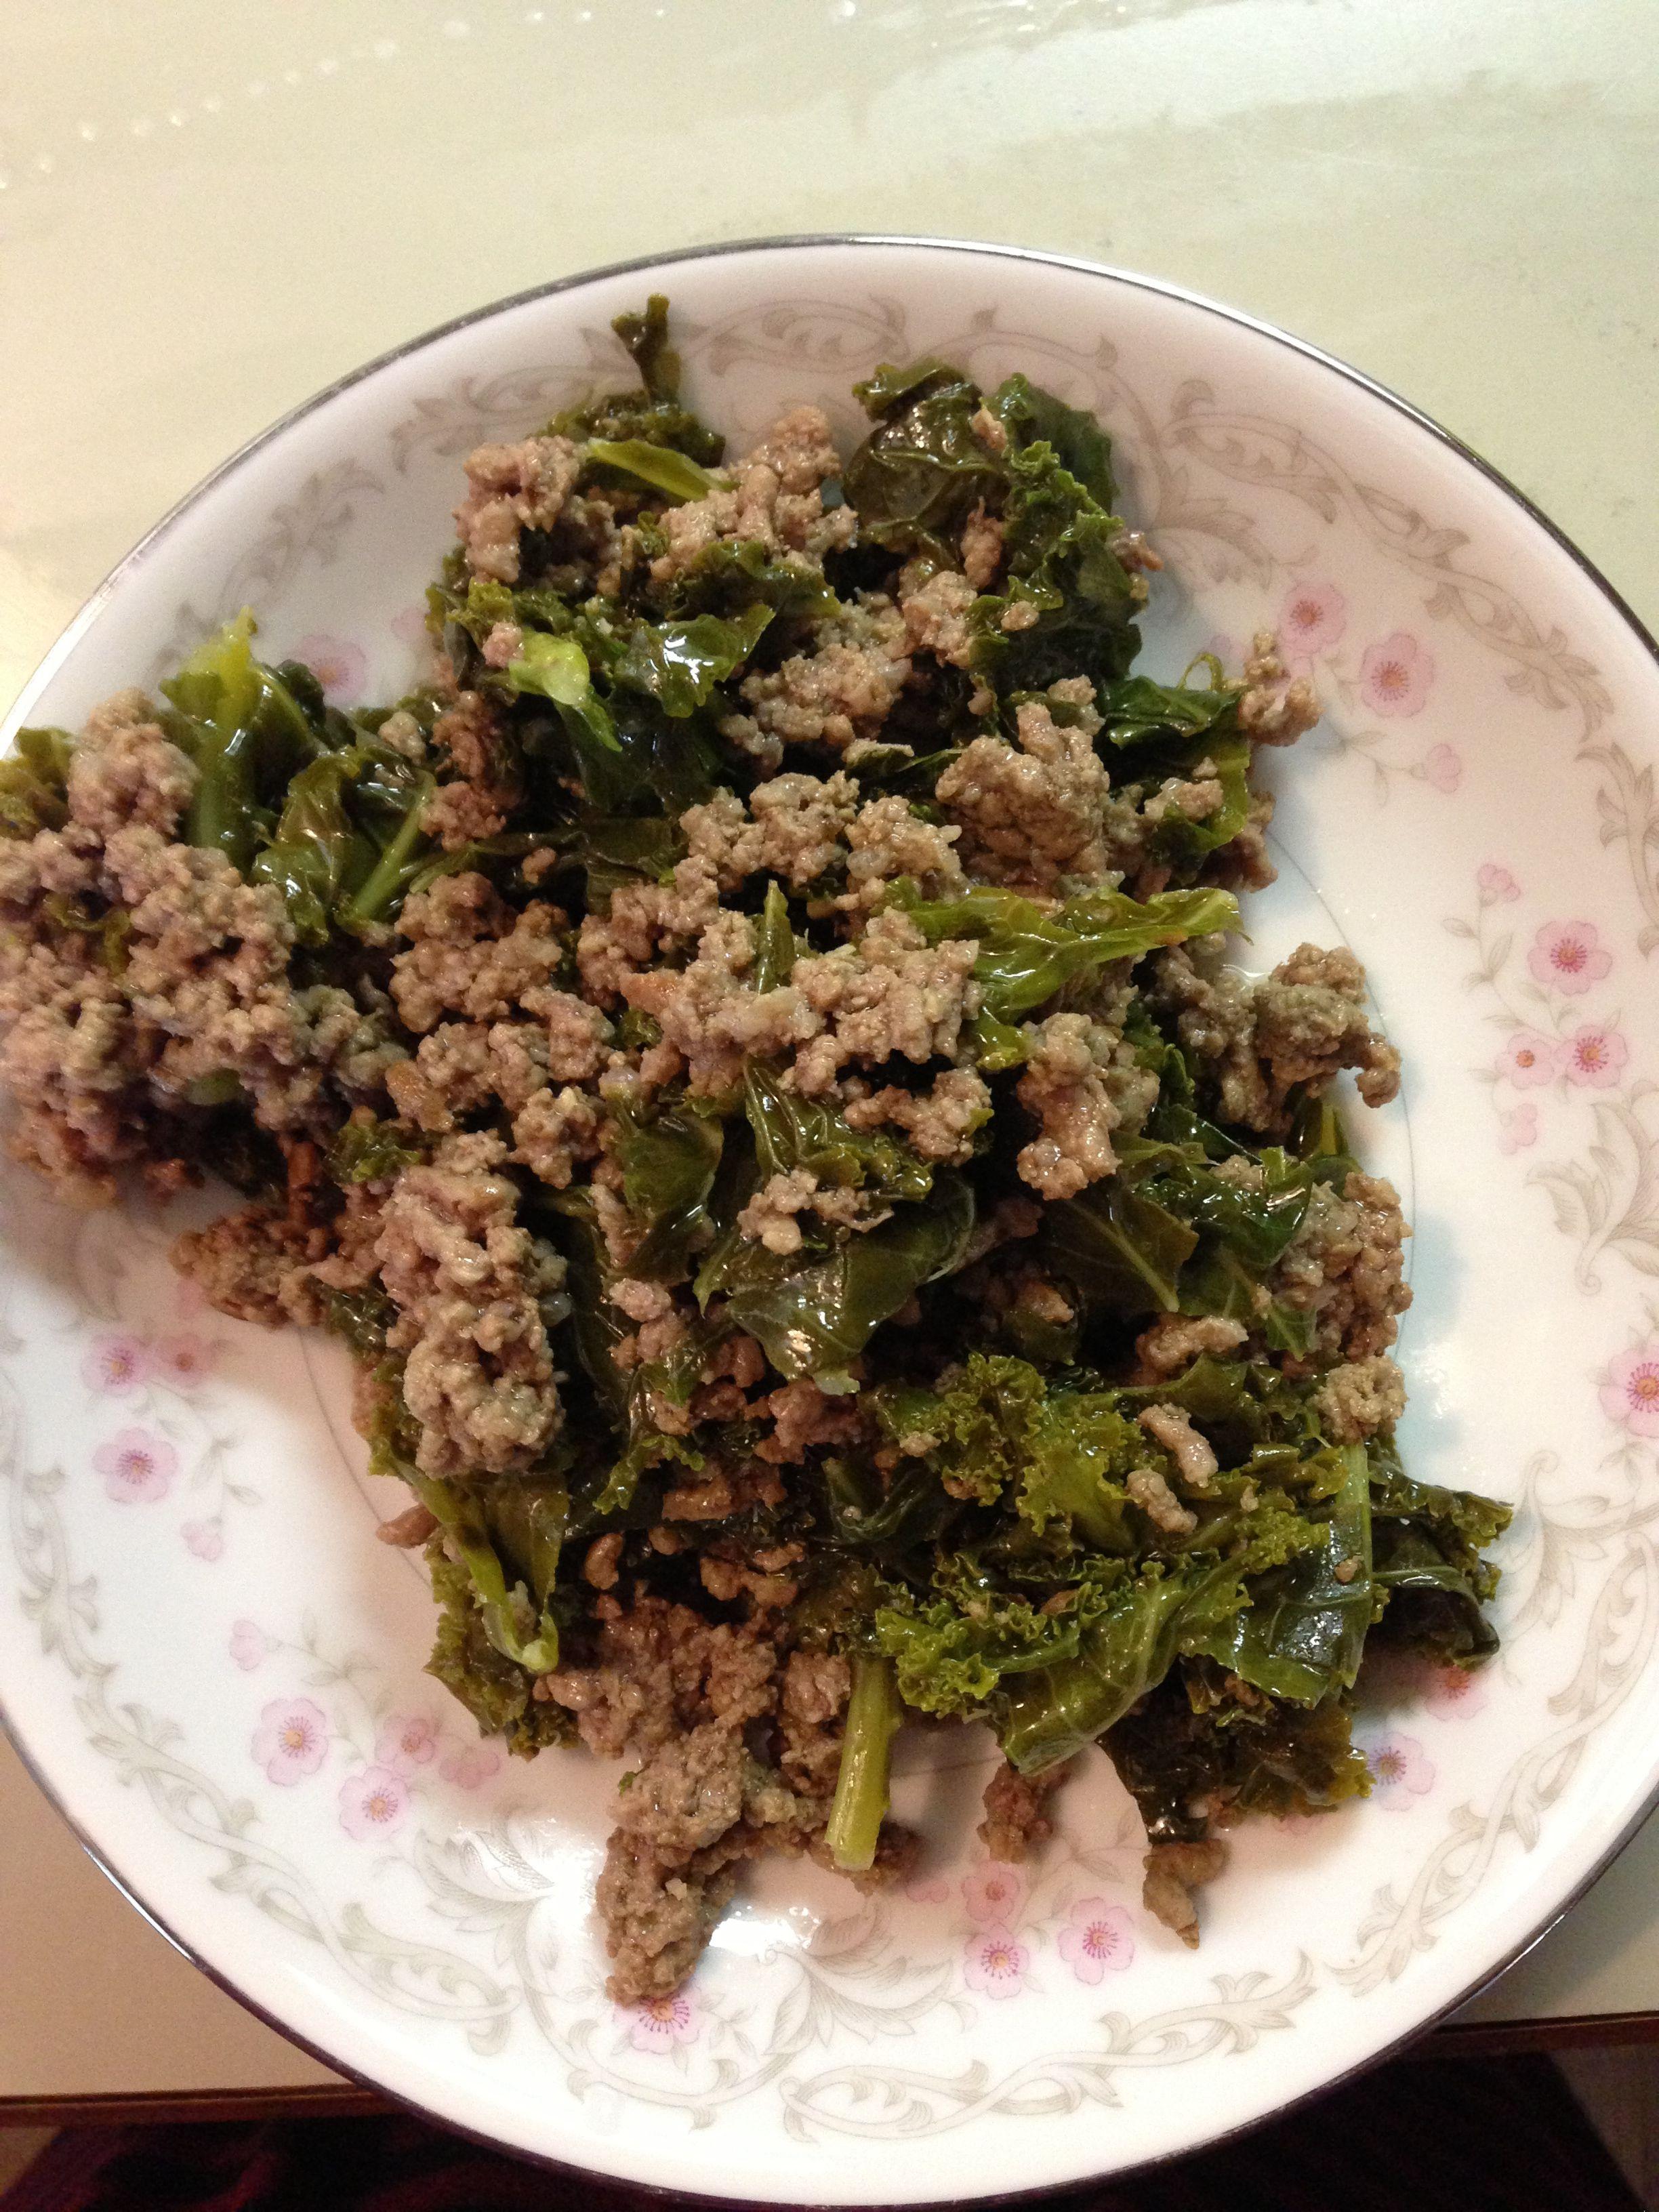 Healthy Grain Free Homemade Dog Food Beef Kale 2 Lbs Any